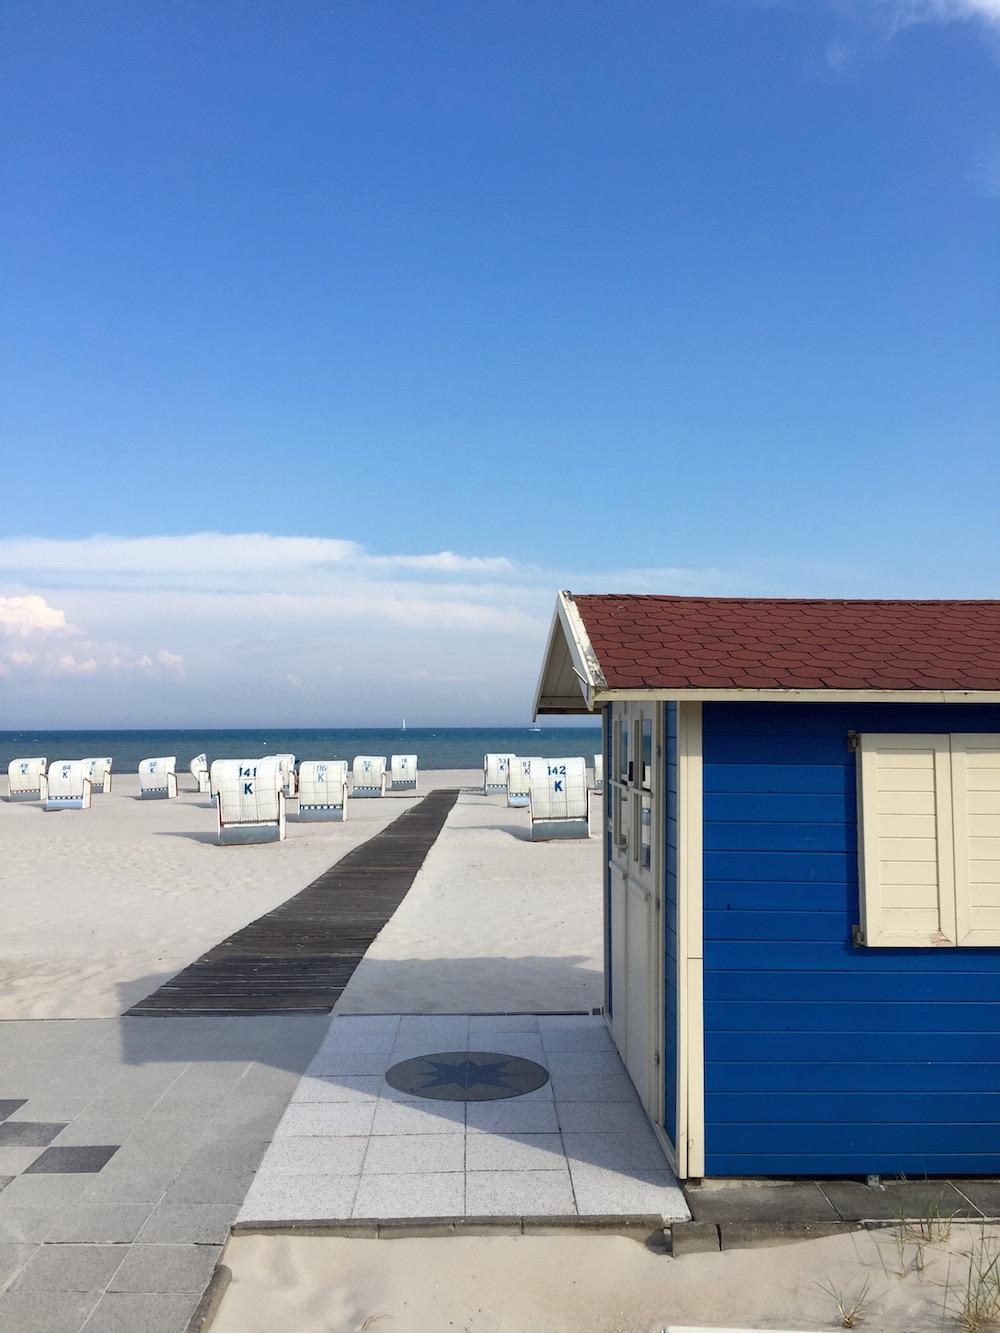 Strandkörbe mieten in Grömitz